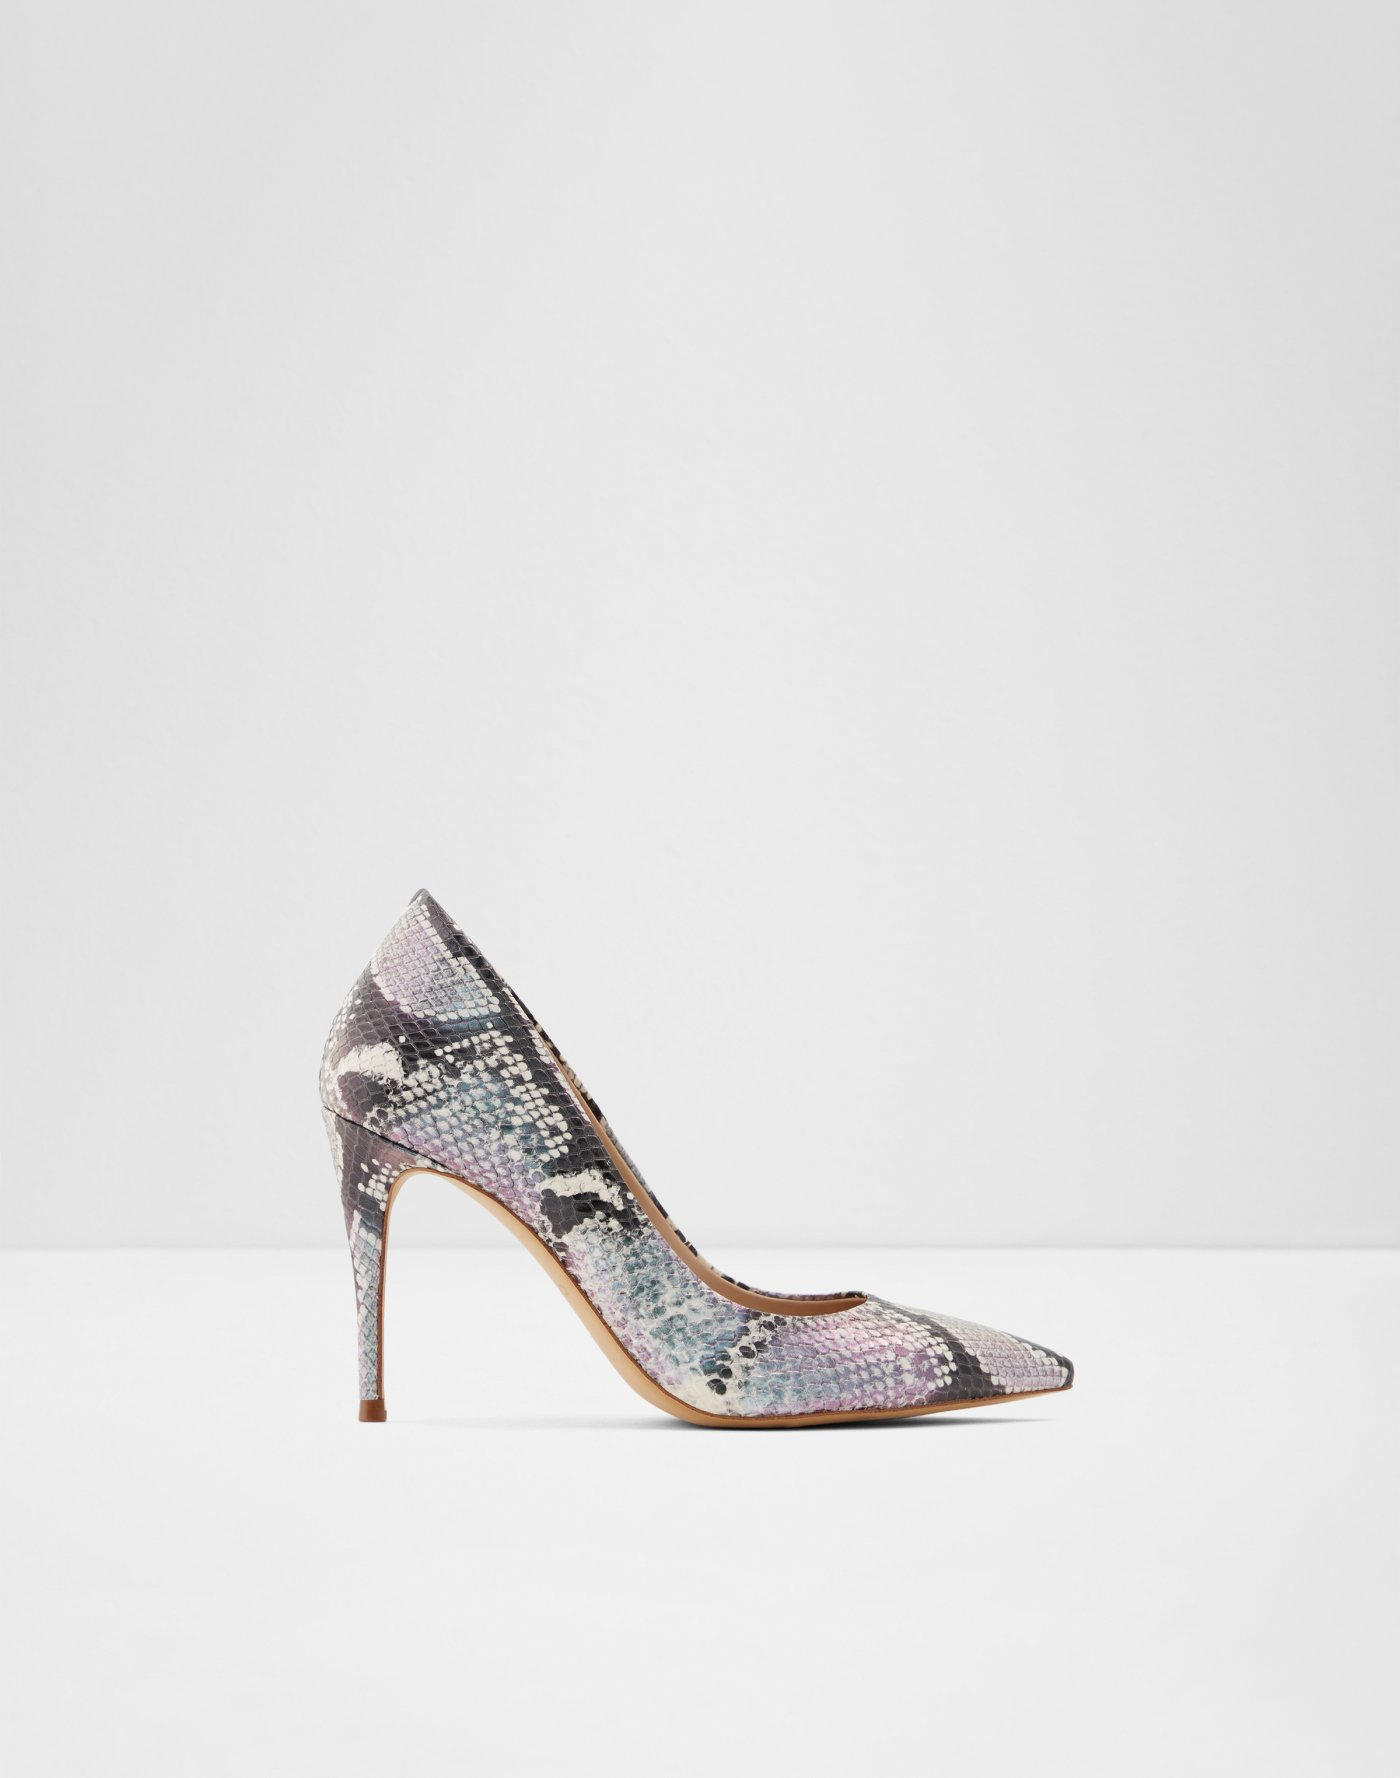 93f68f537a4 Heels For Women | Stilettos & High Heels | ALDO Canada | ALDO Canada